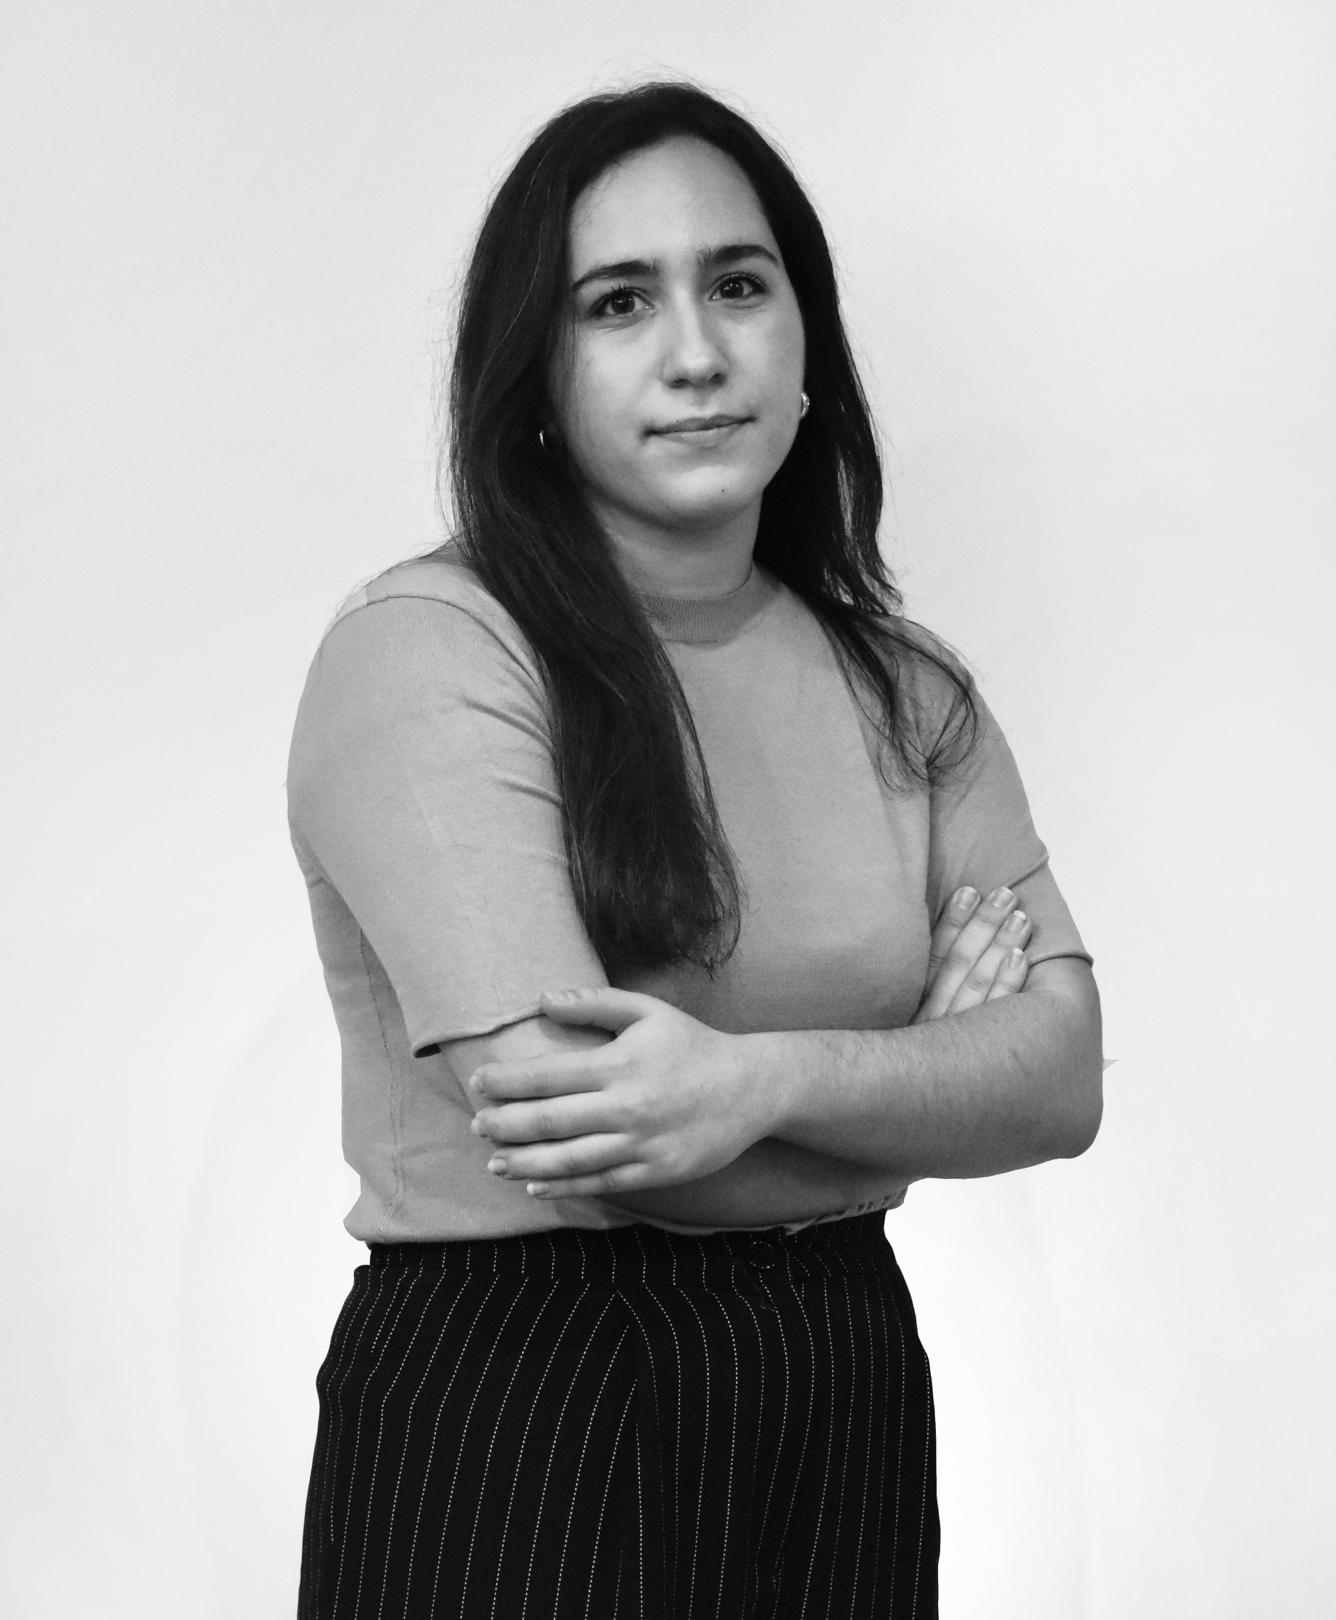 Catarina Branco Ribeiro foto.